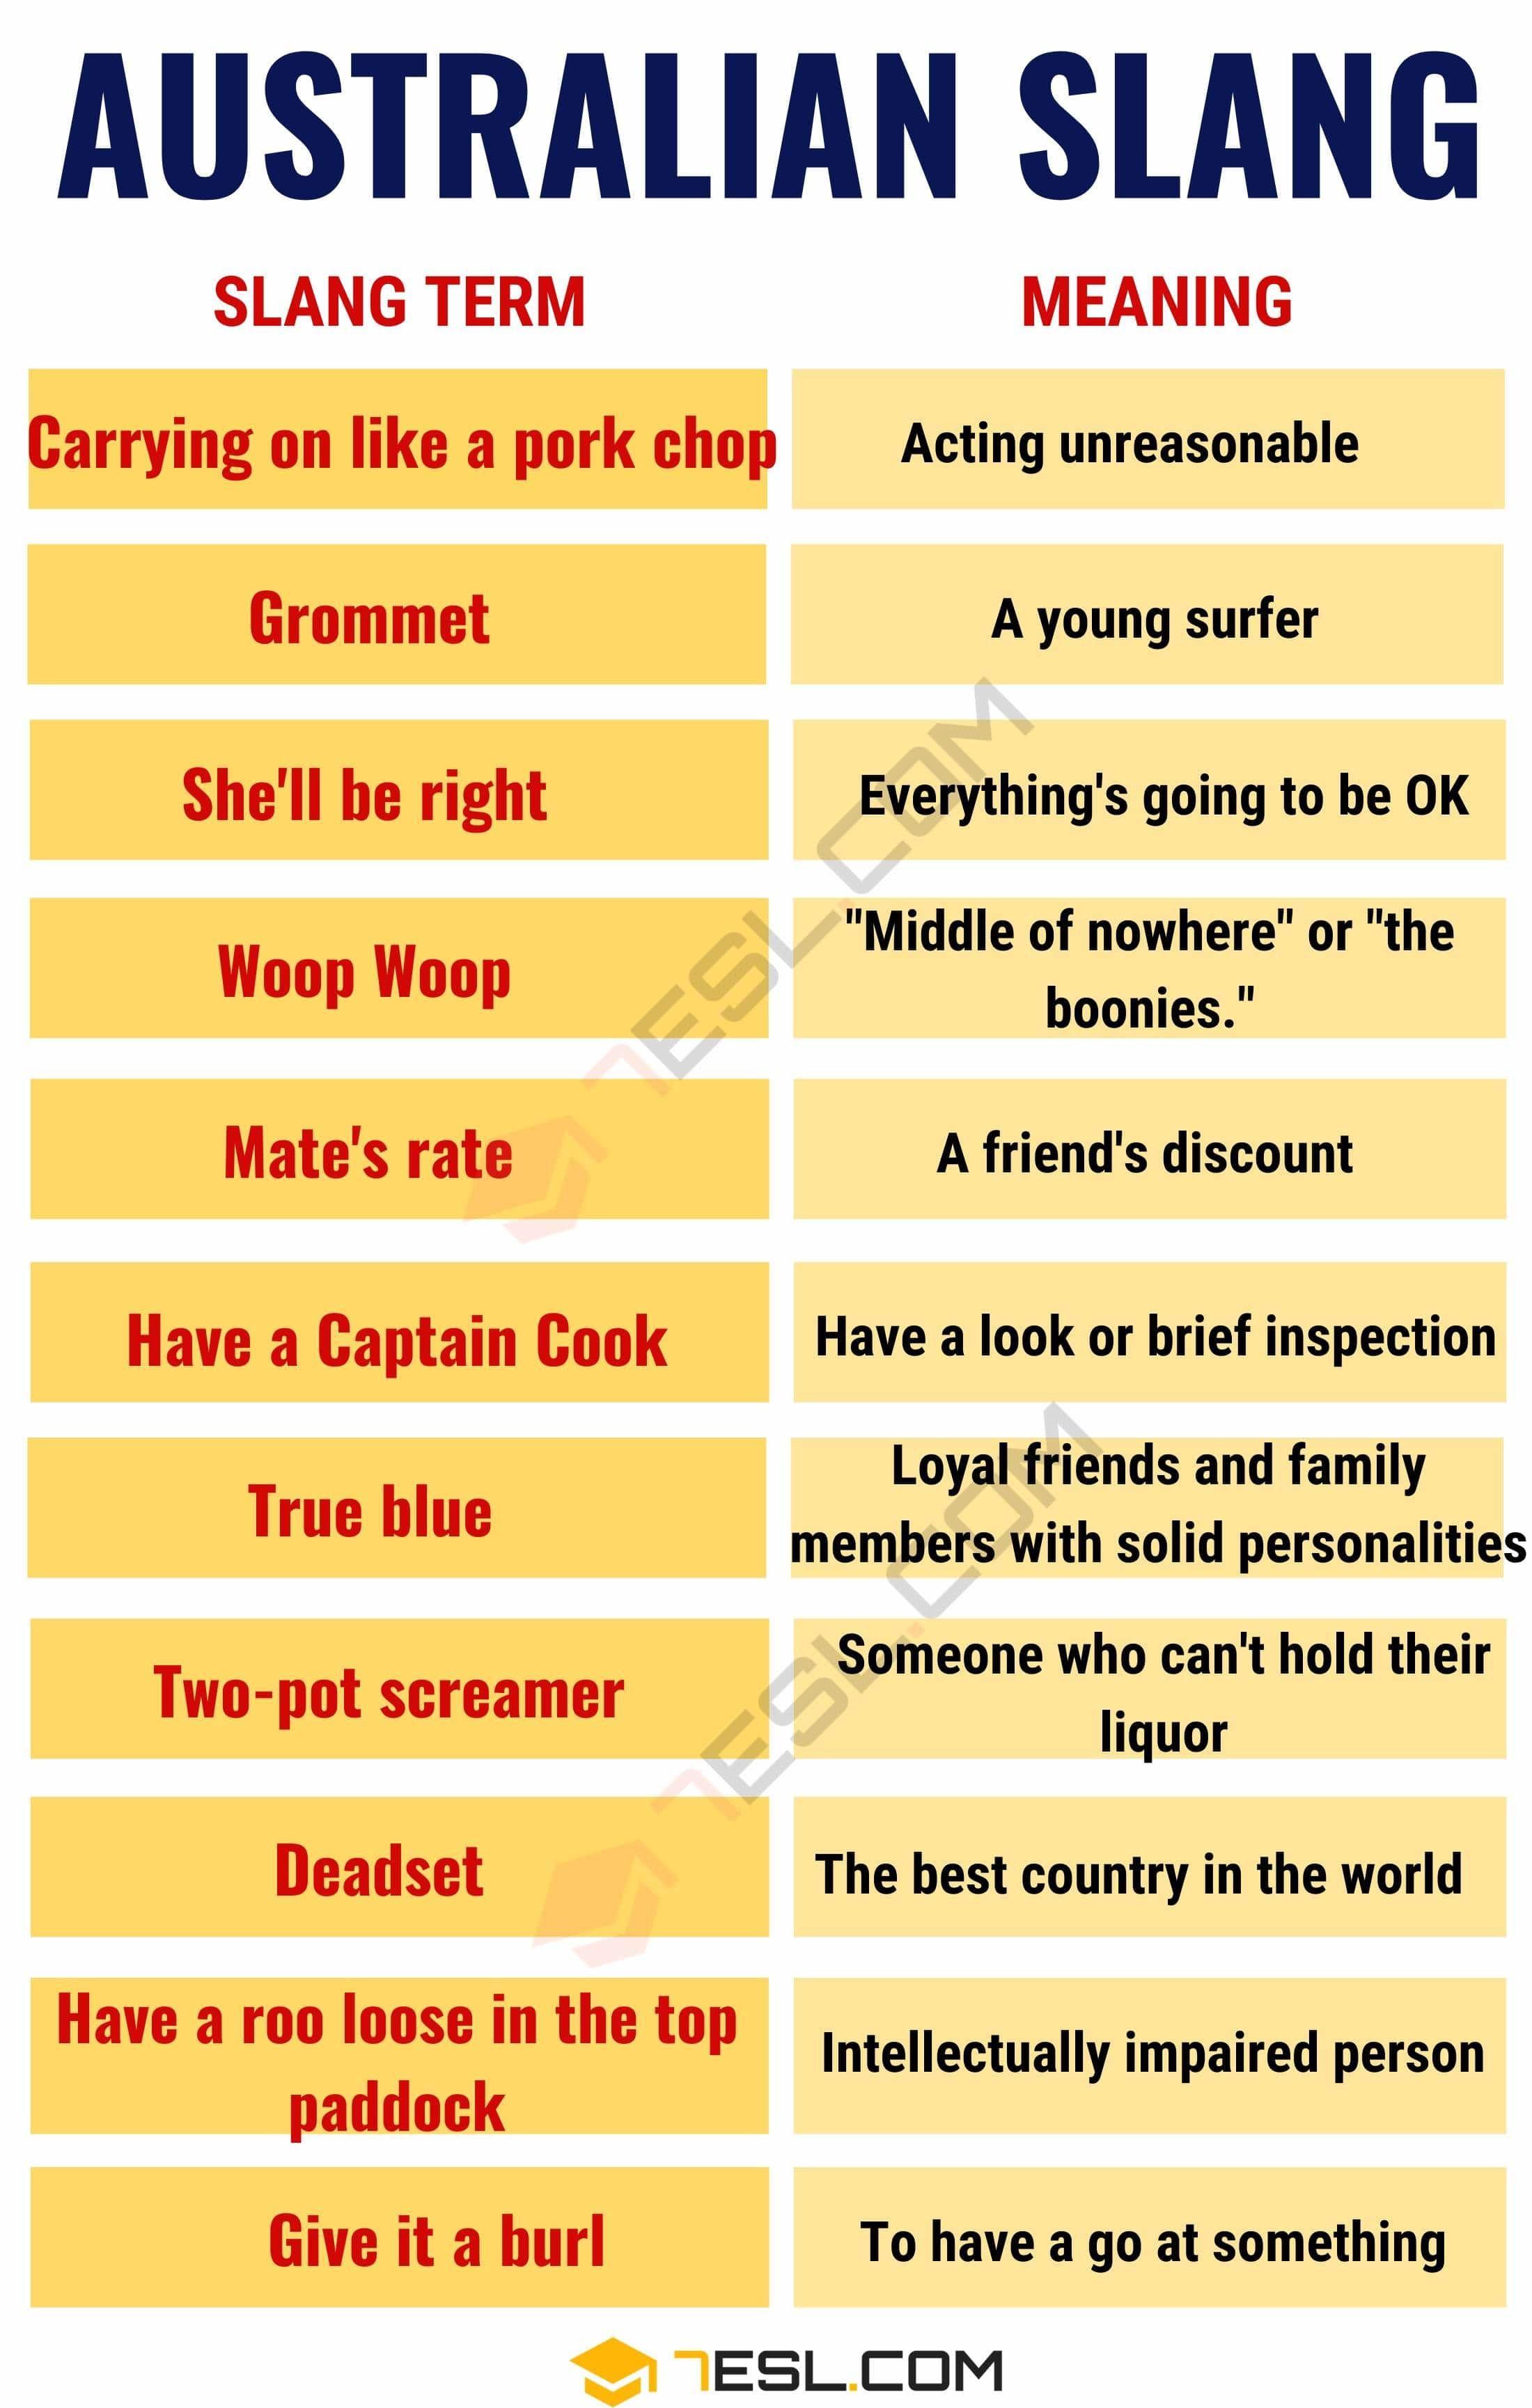 Australian Slang 23 Popular Aussie Slang Words You Need To Know 7esl Australian Slang Slang English Slang Words